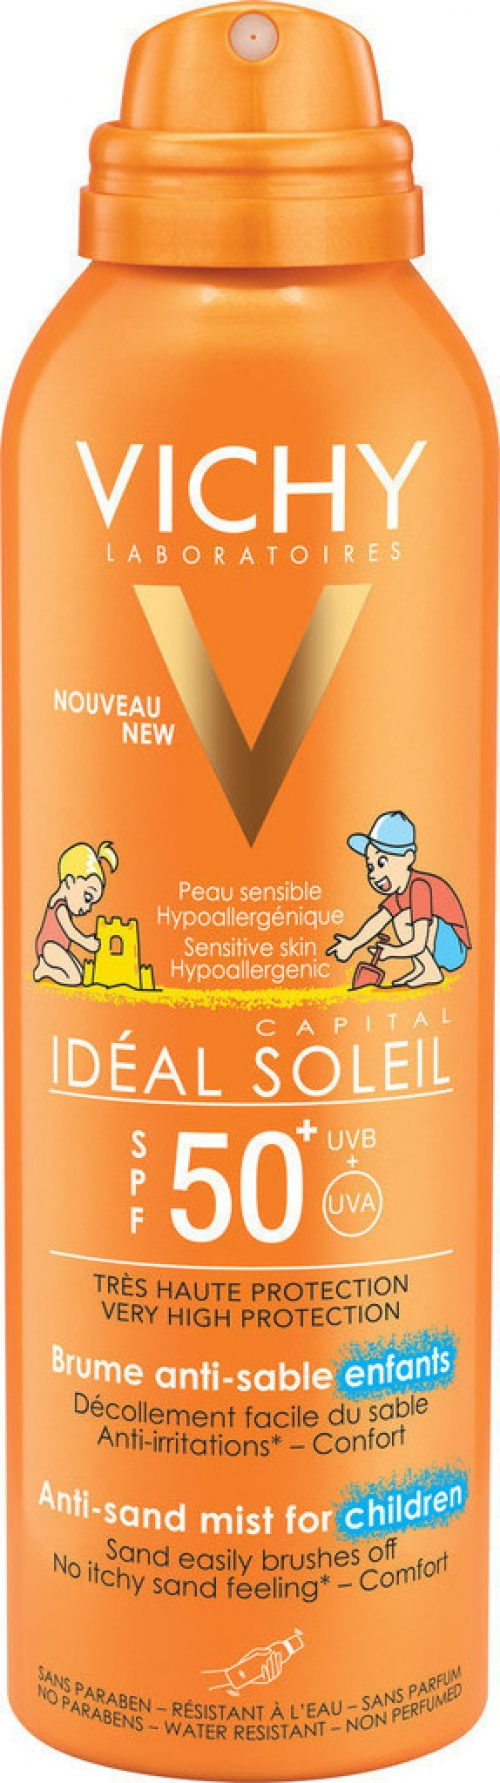 Vichy Capital Ideal Soleil Anti Sand Enfants SPF50 200ml